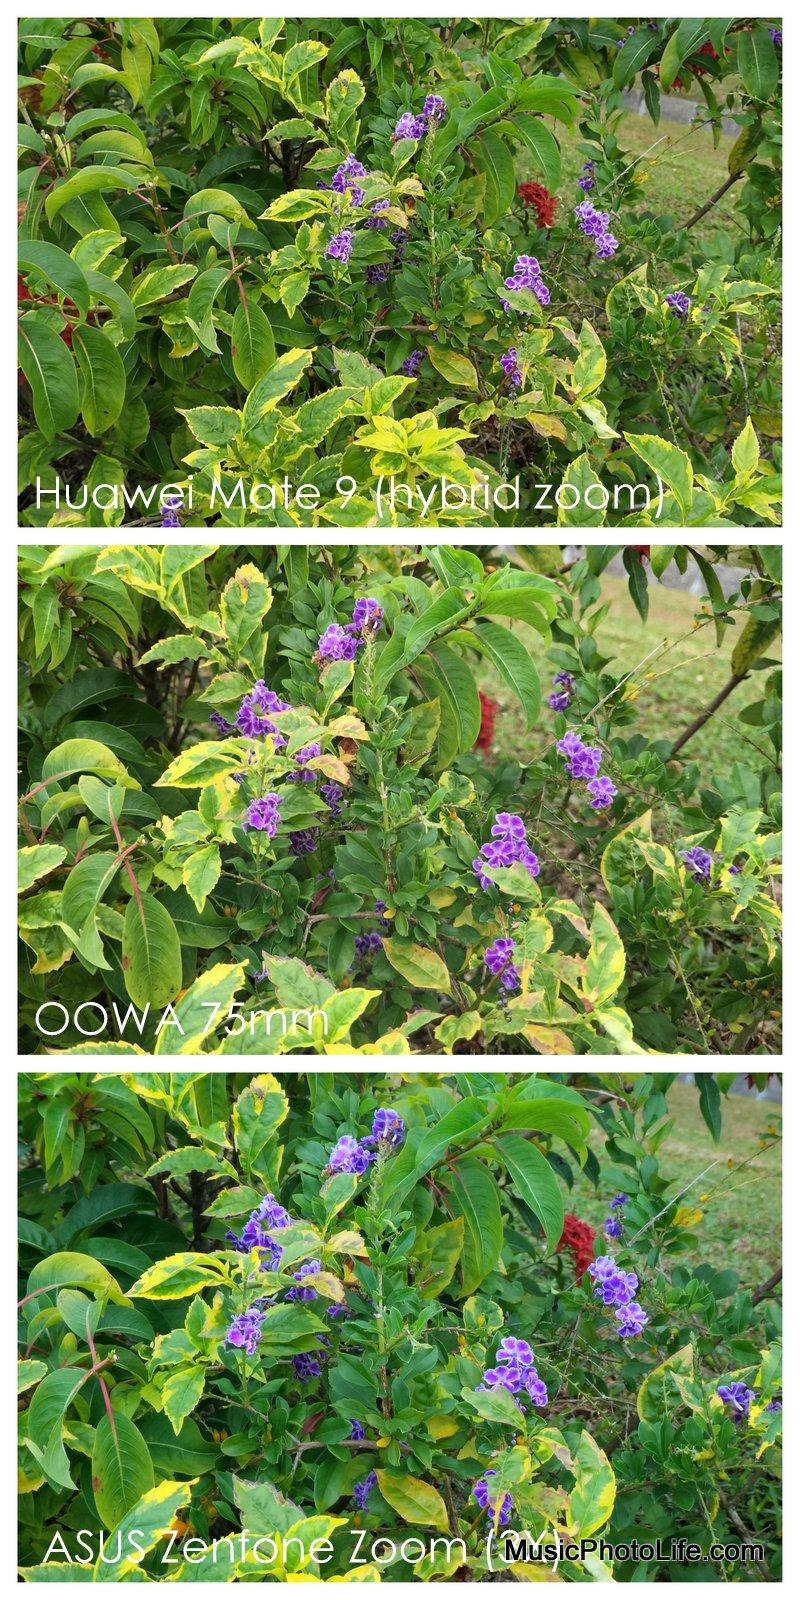 OOWA 75mm, Huawei Mate9, ASUS Zenfone Zoom comparison